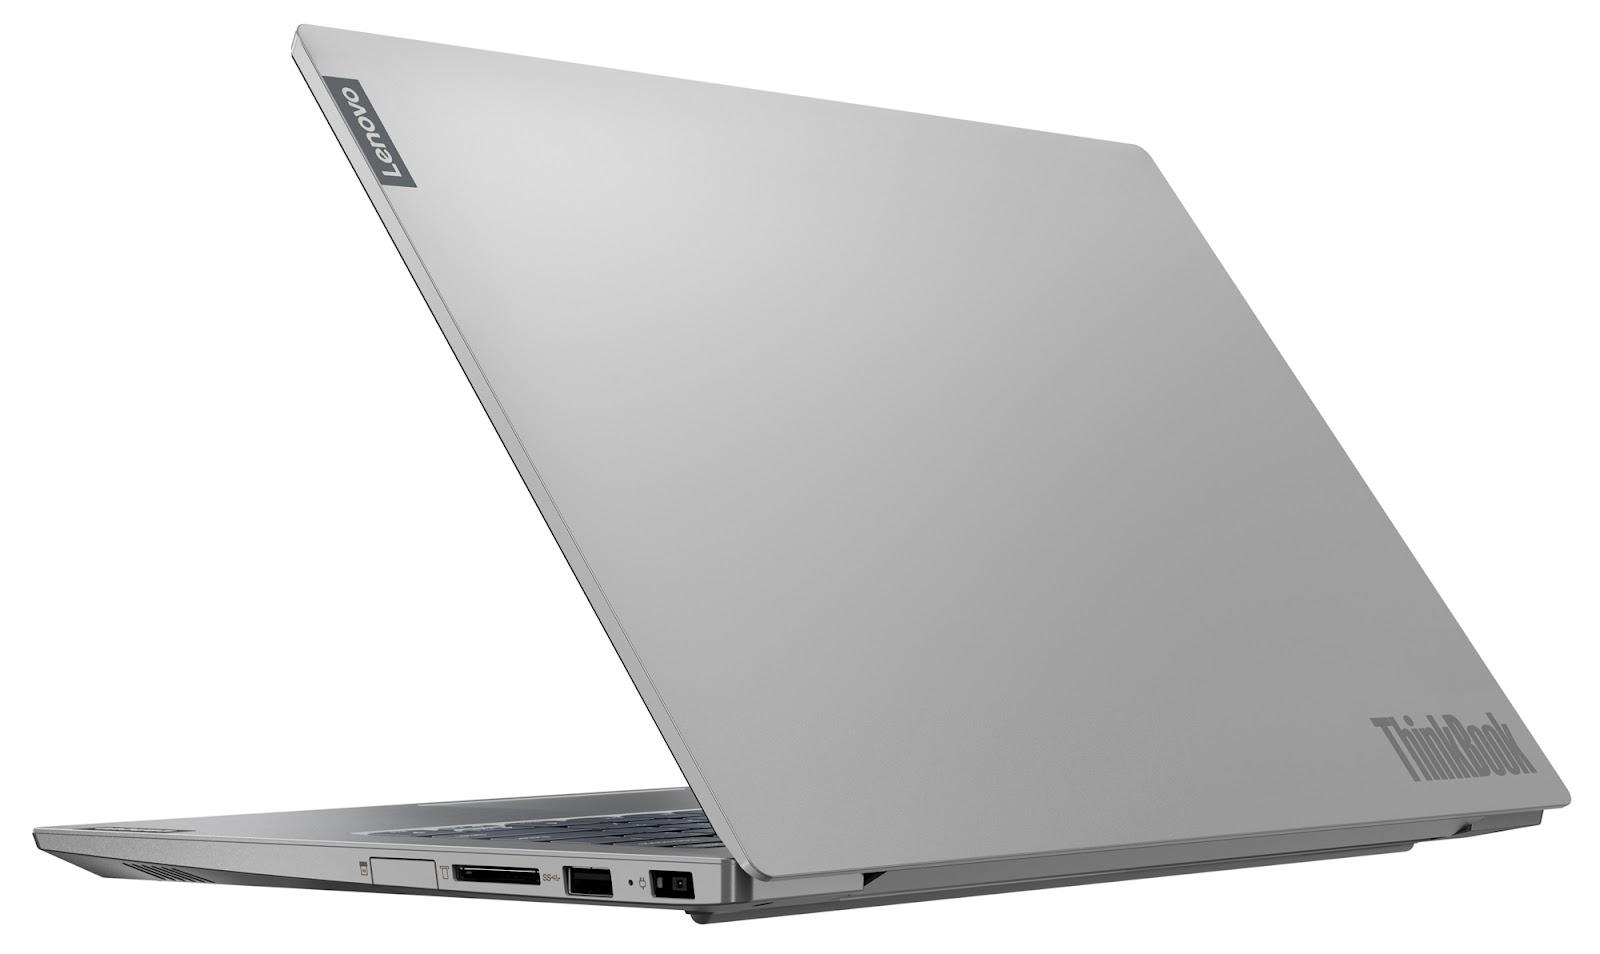 Фото 2. Ноутбук Lenovo ThinkBook 14 IIL (20SL002VRU)